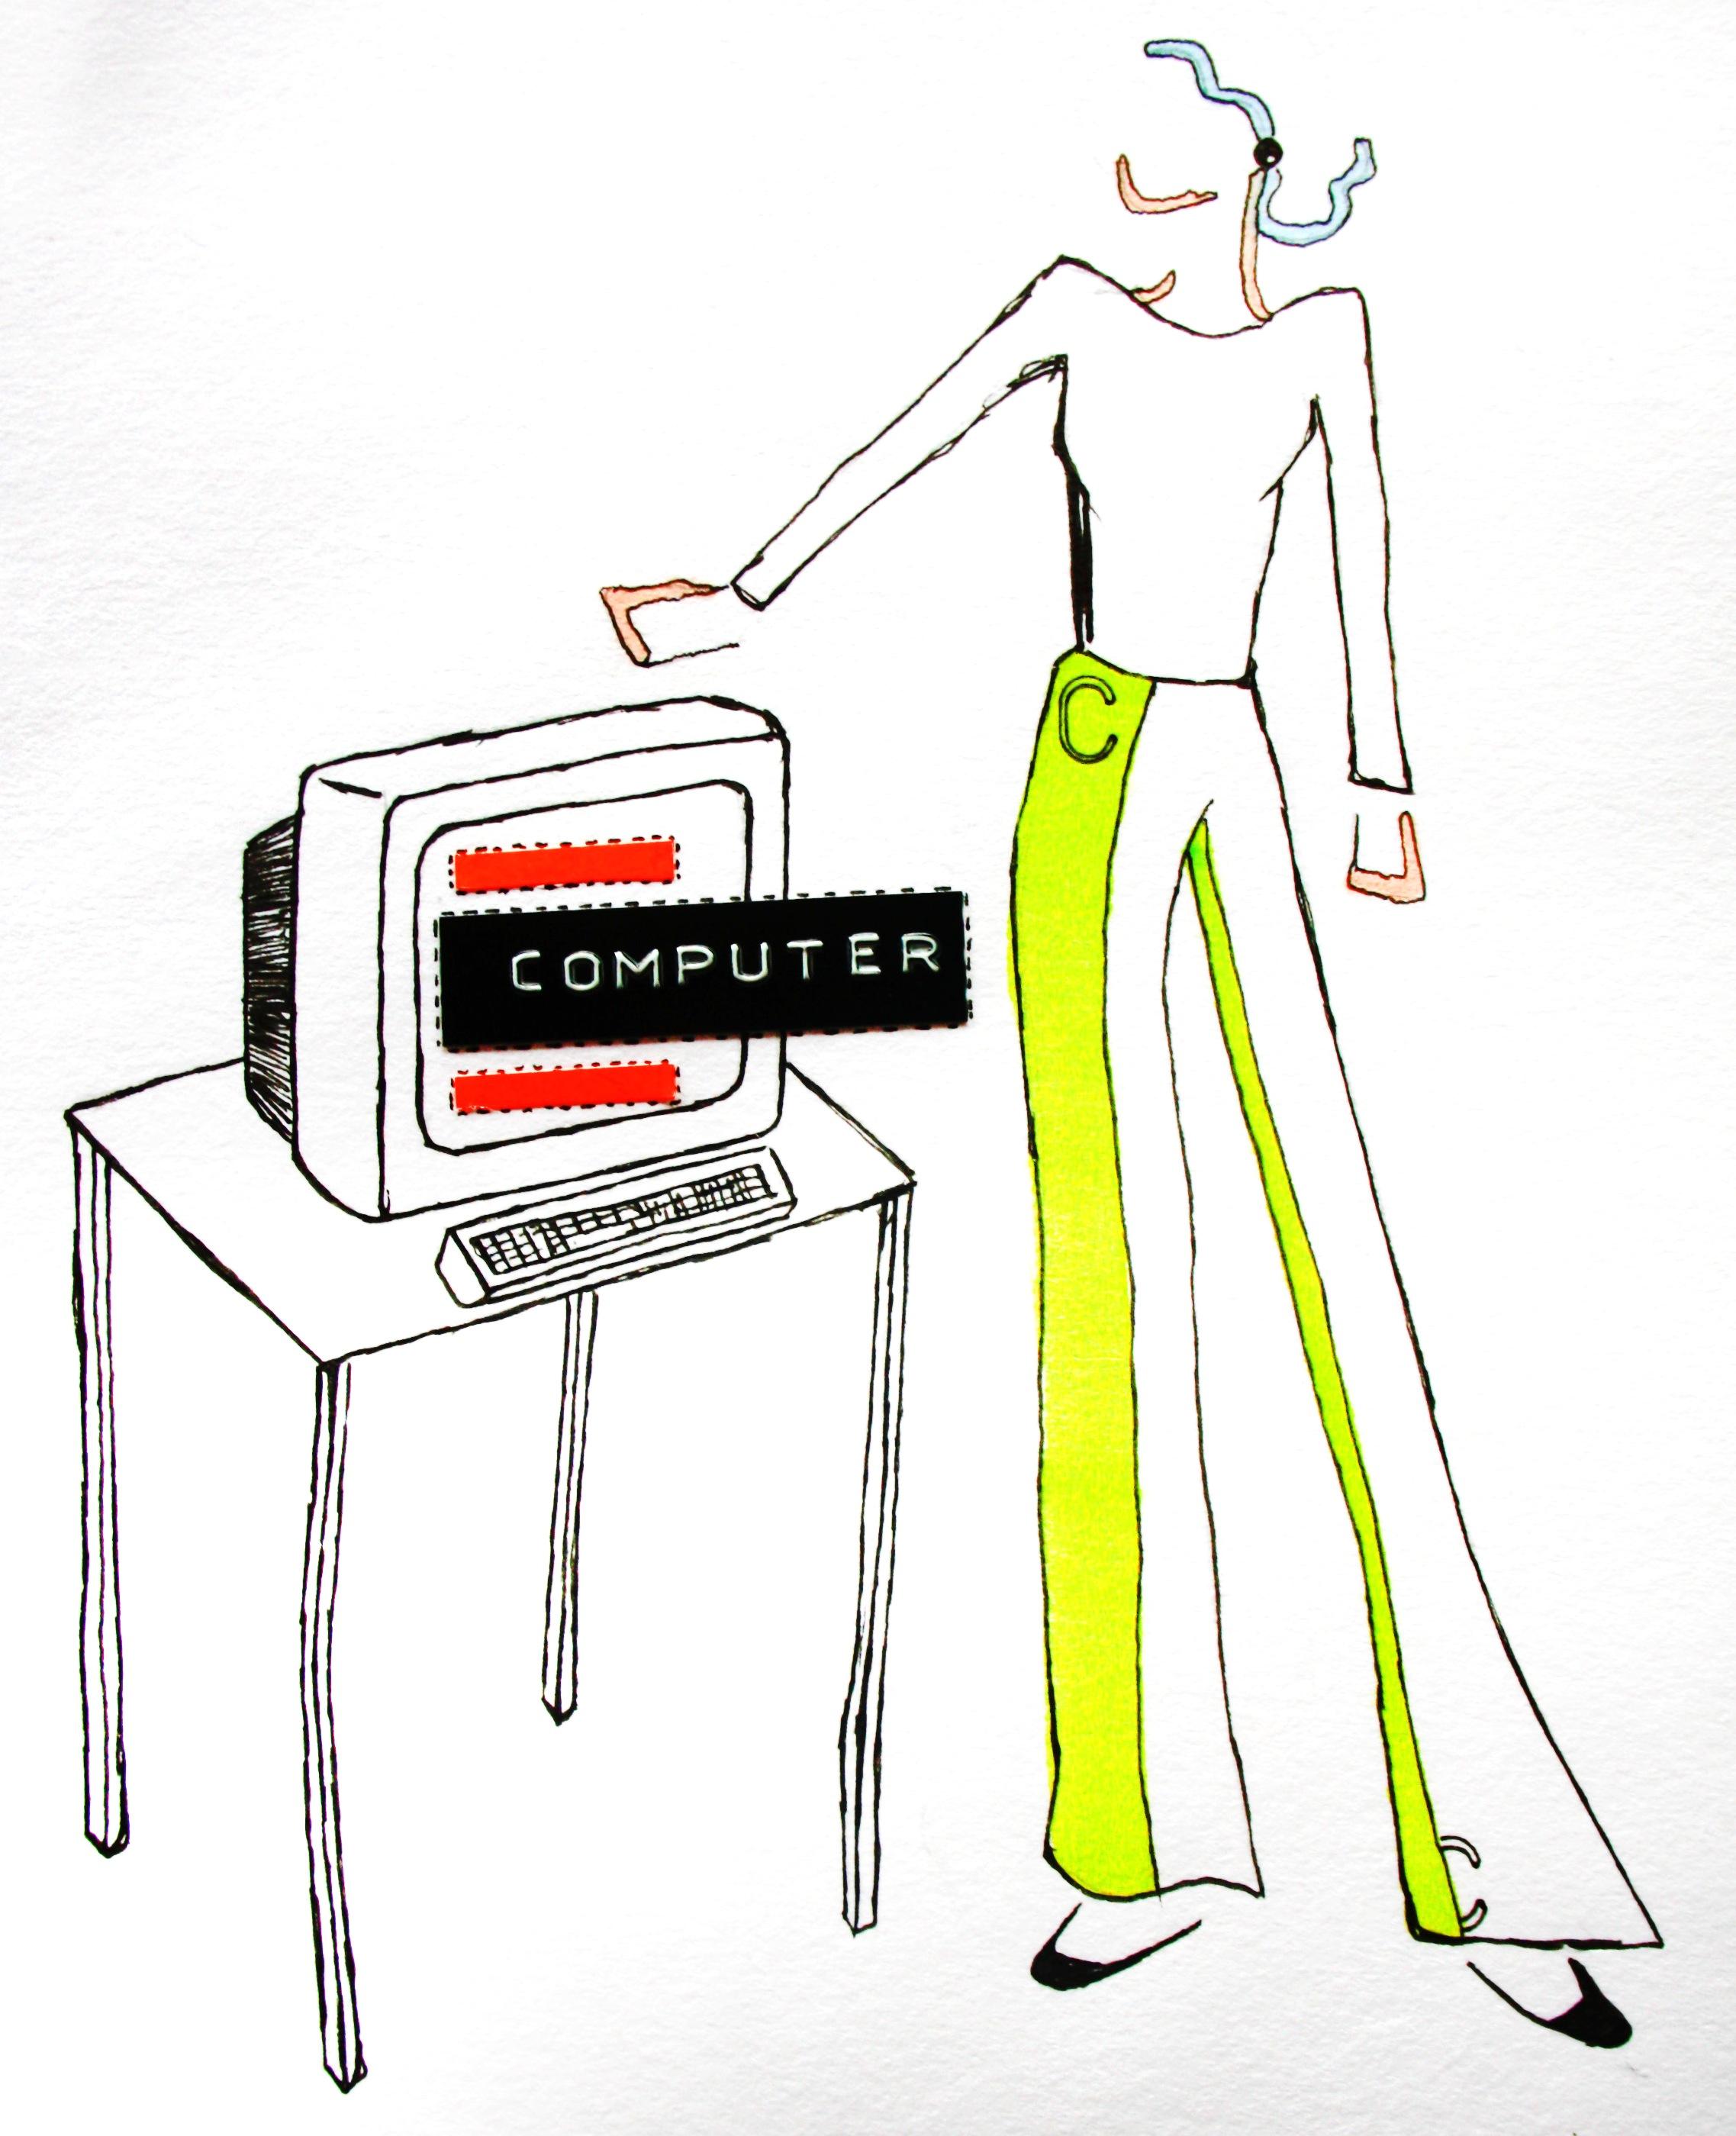 Computer Drawing.jpg